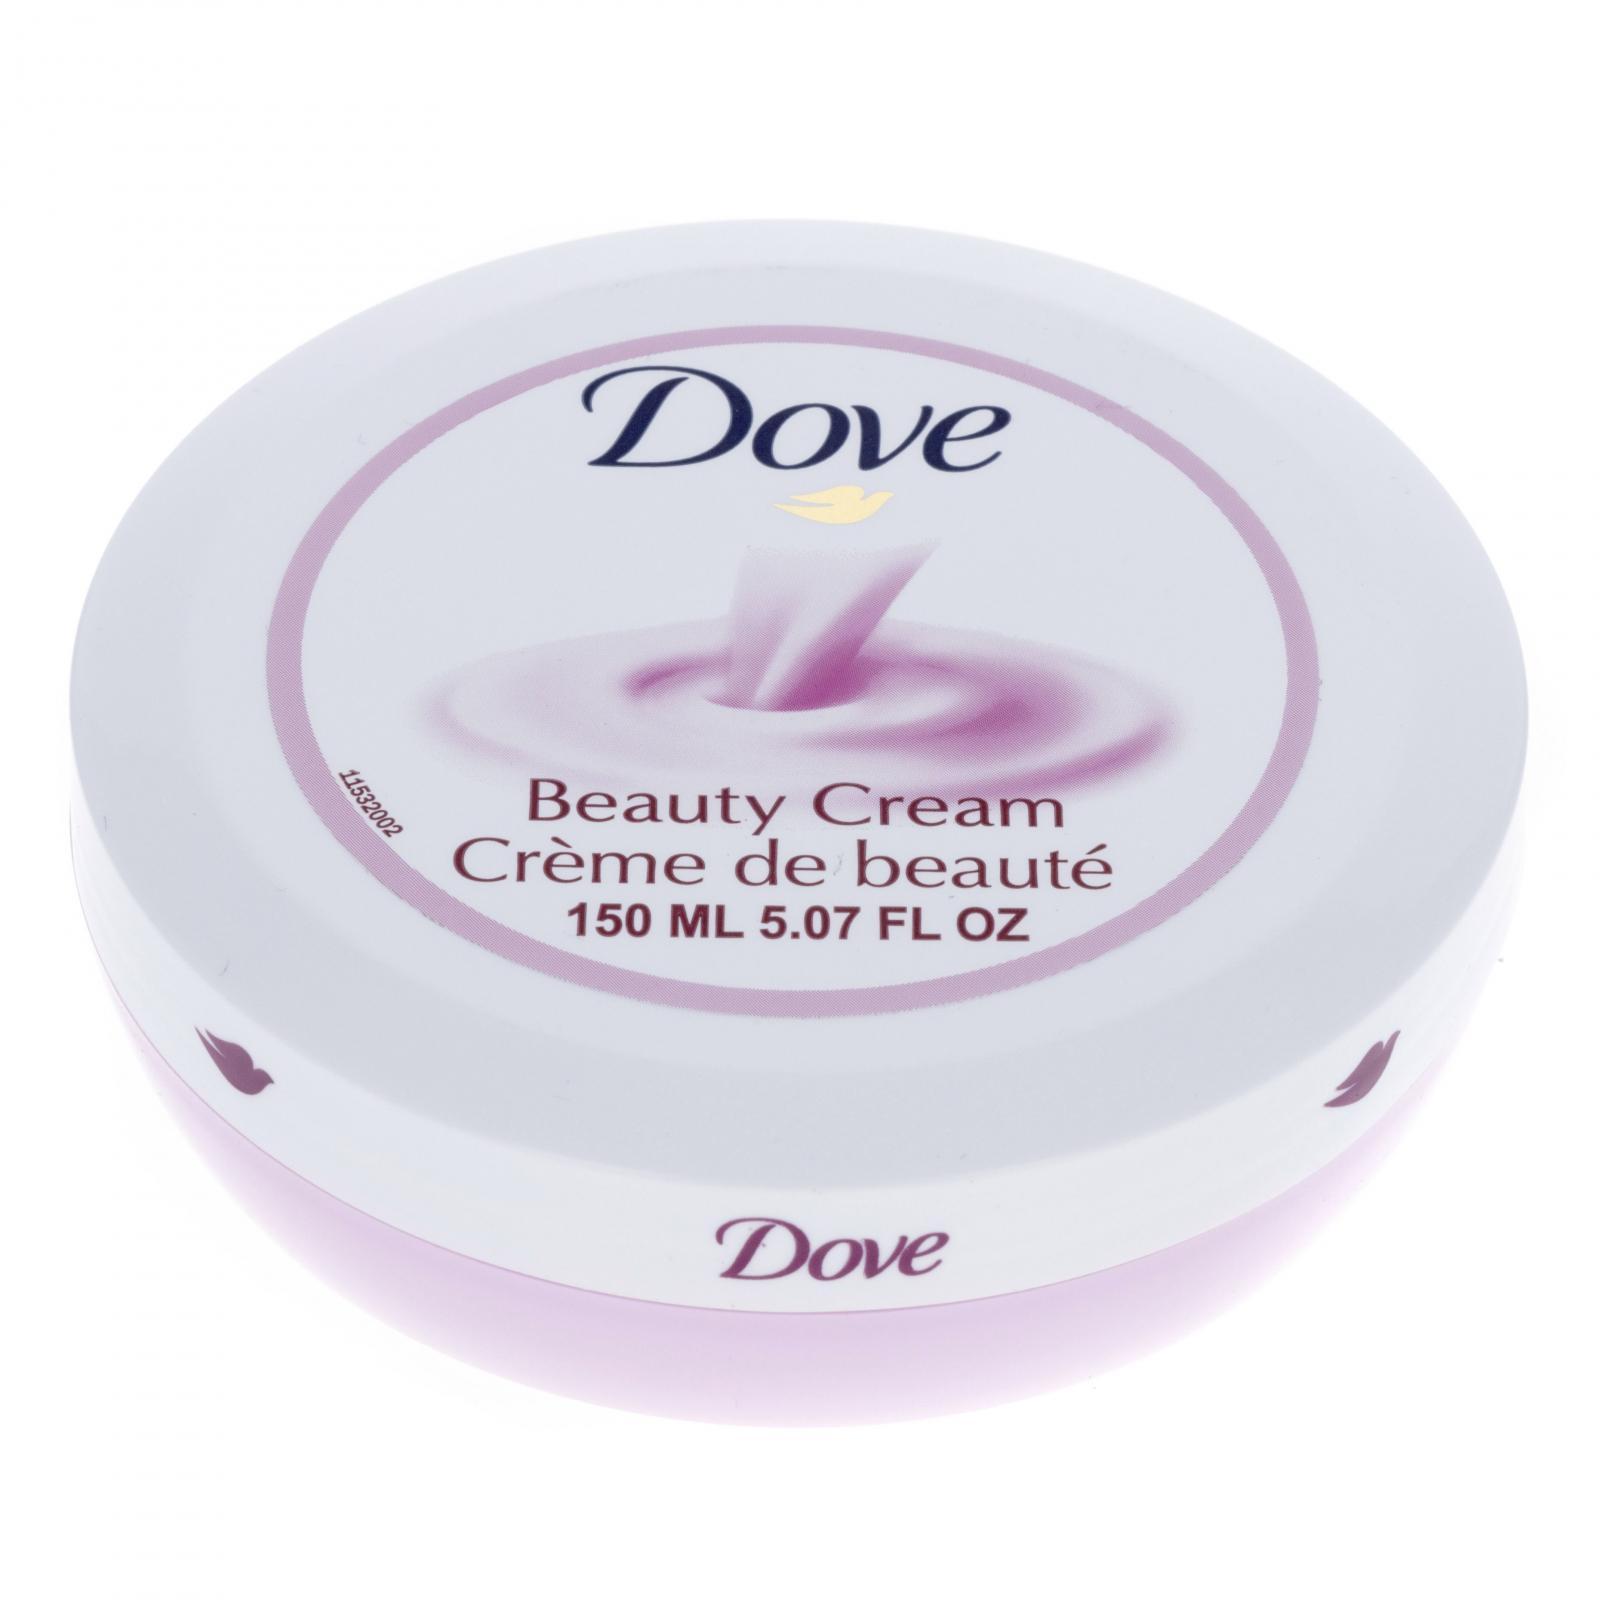 Dove Beauty Cream Skin Care Lotion 24 Hour Moisturization